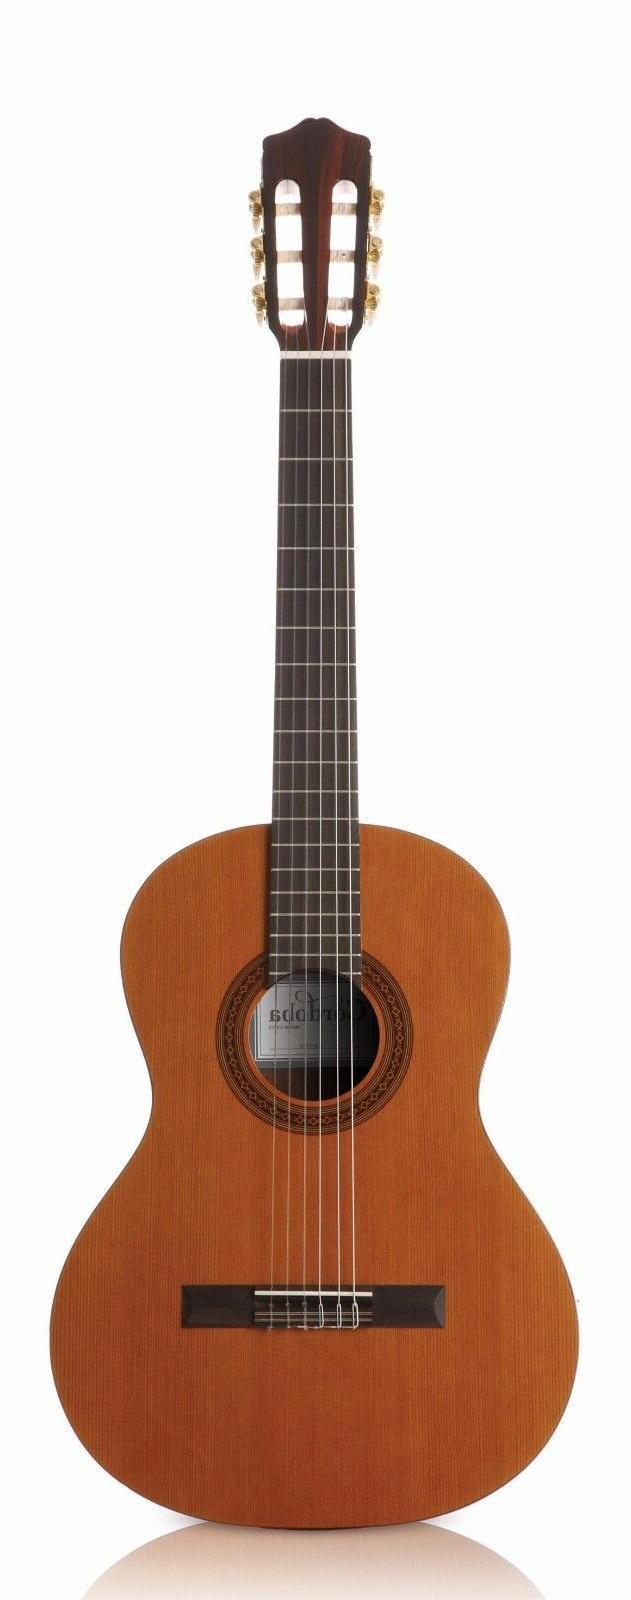 dolce 7 8 acoustic nylon